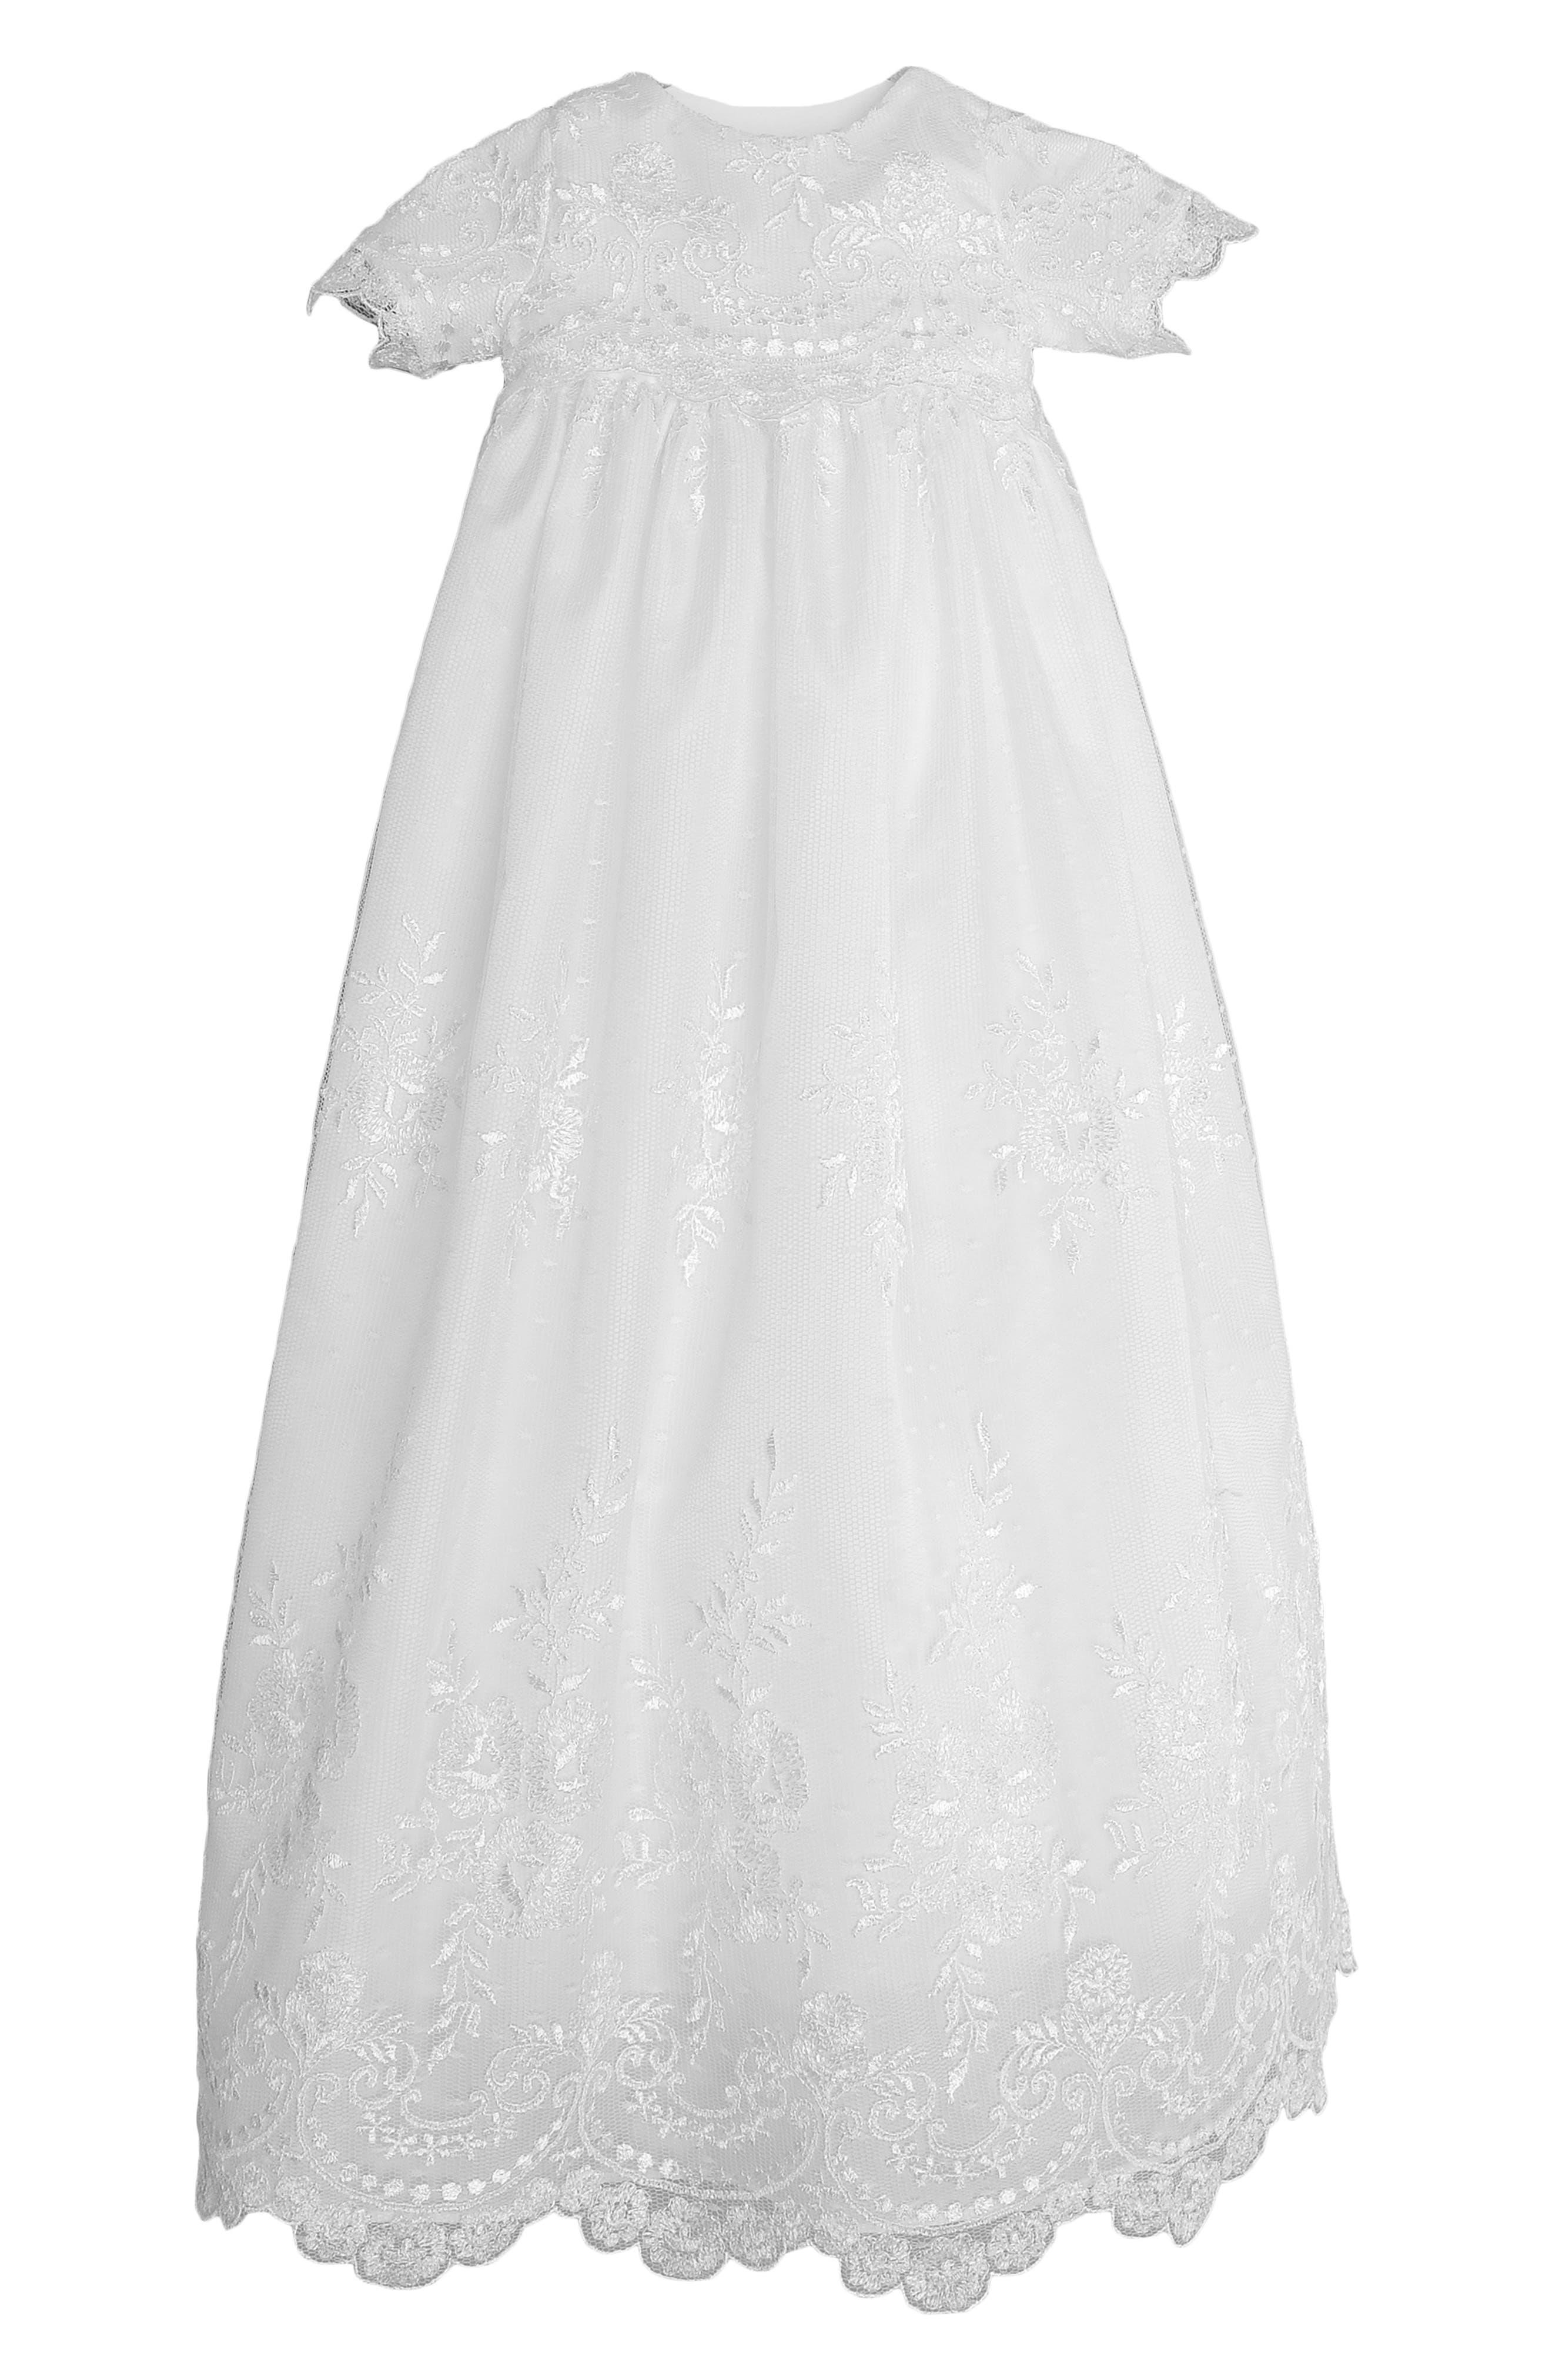 LITTLE THINGS MEAN A LOT, Christening Gown, Shawl, Slip & Bonnet Set, Main thumbnail 1, color, WHITE